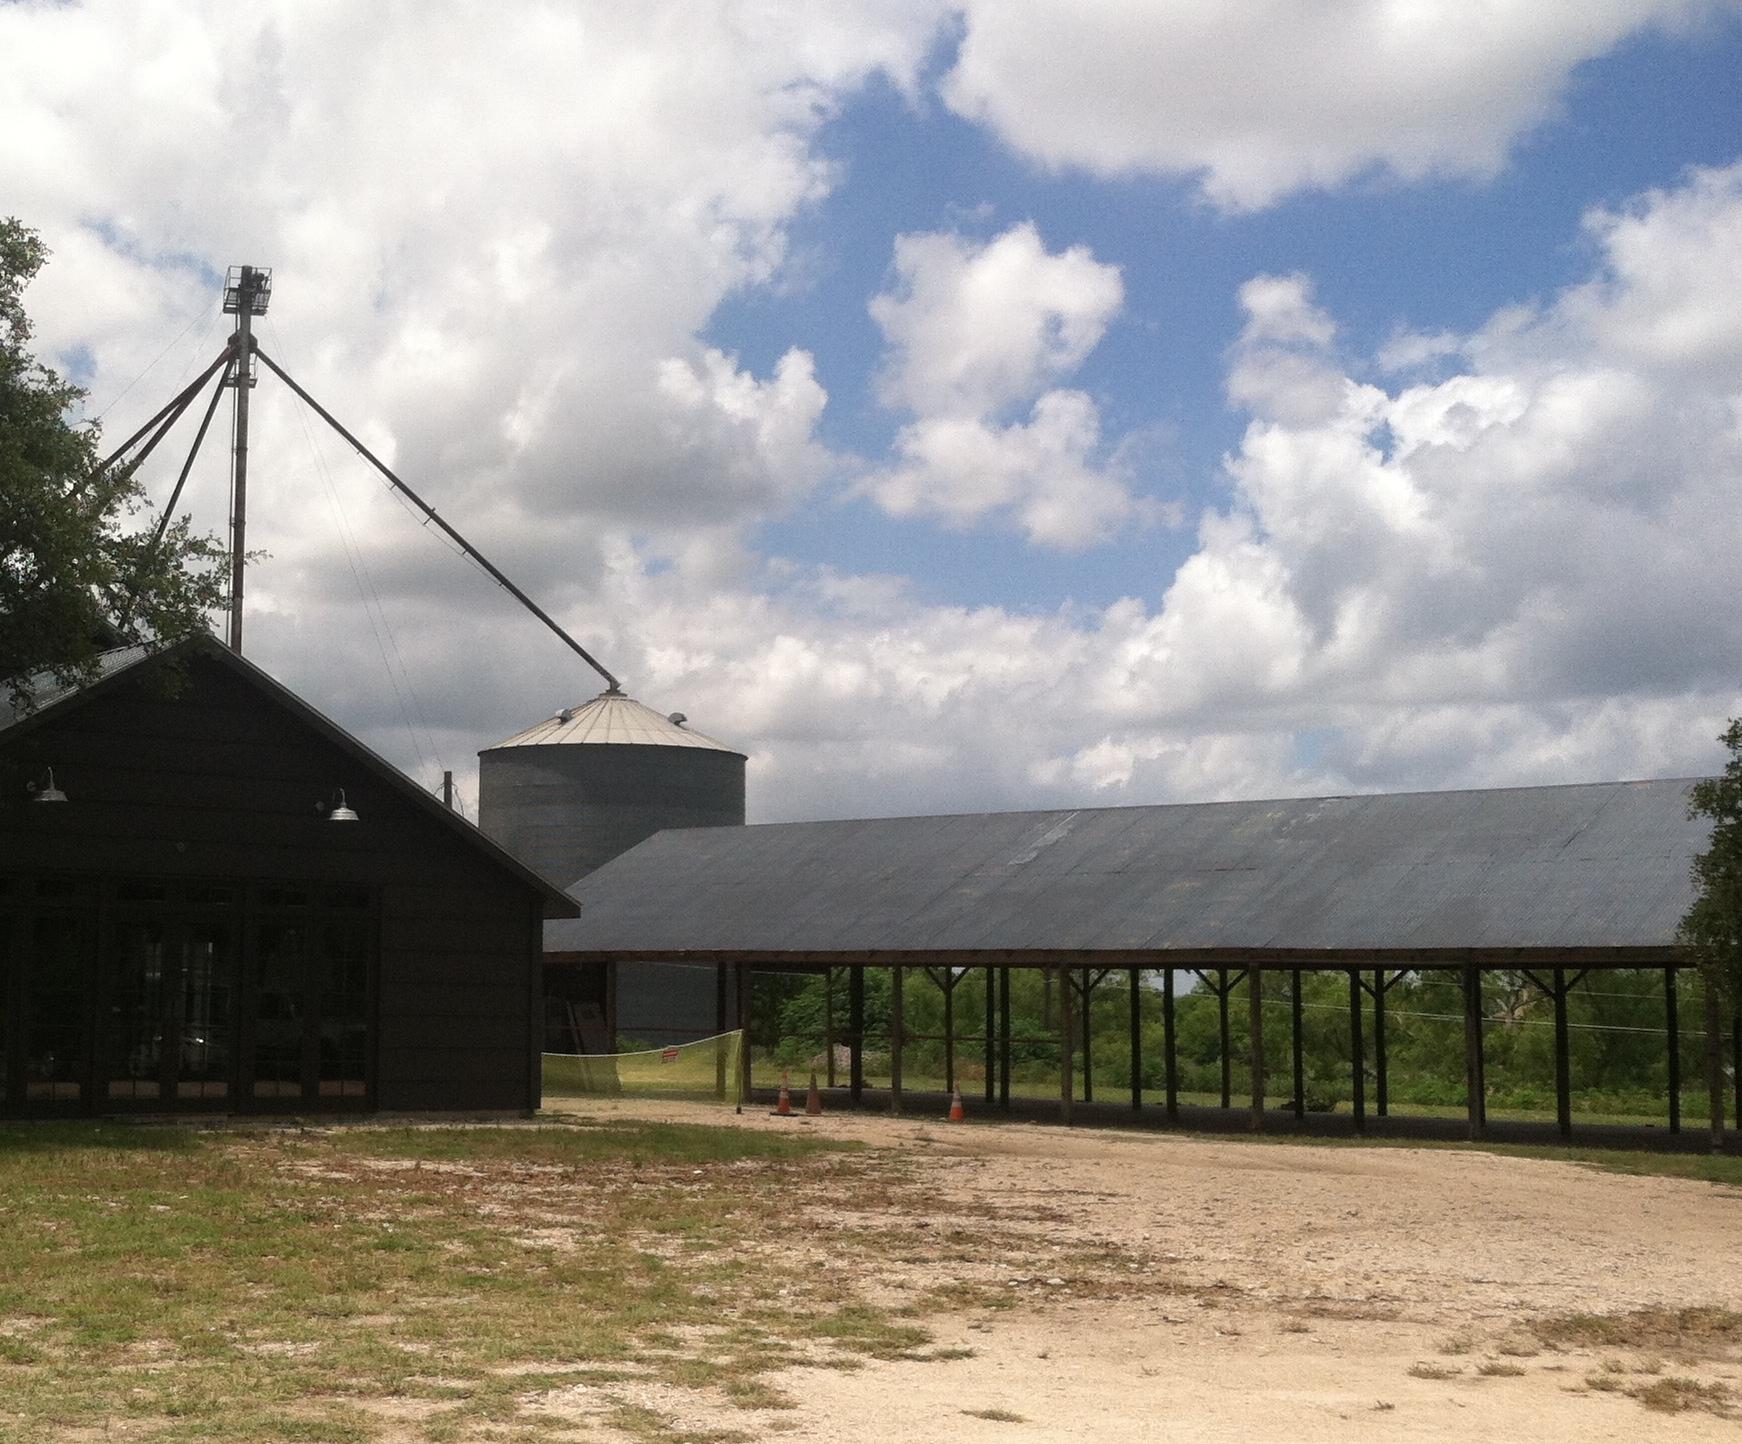 The original pole barn structure